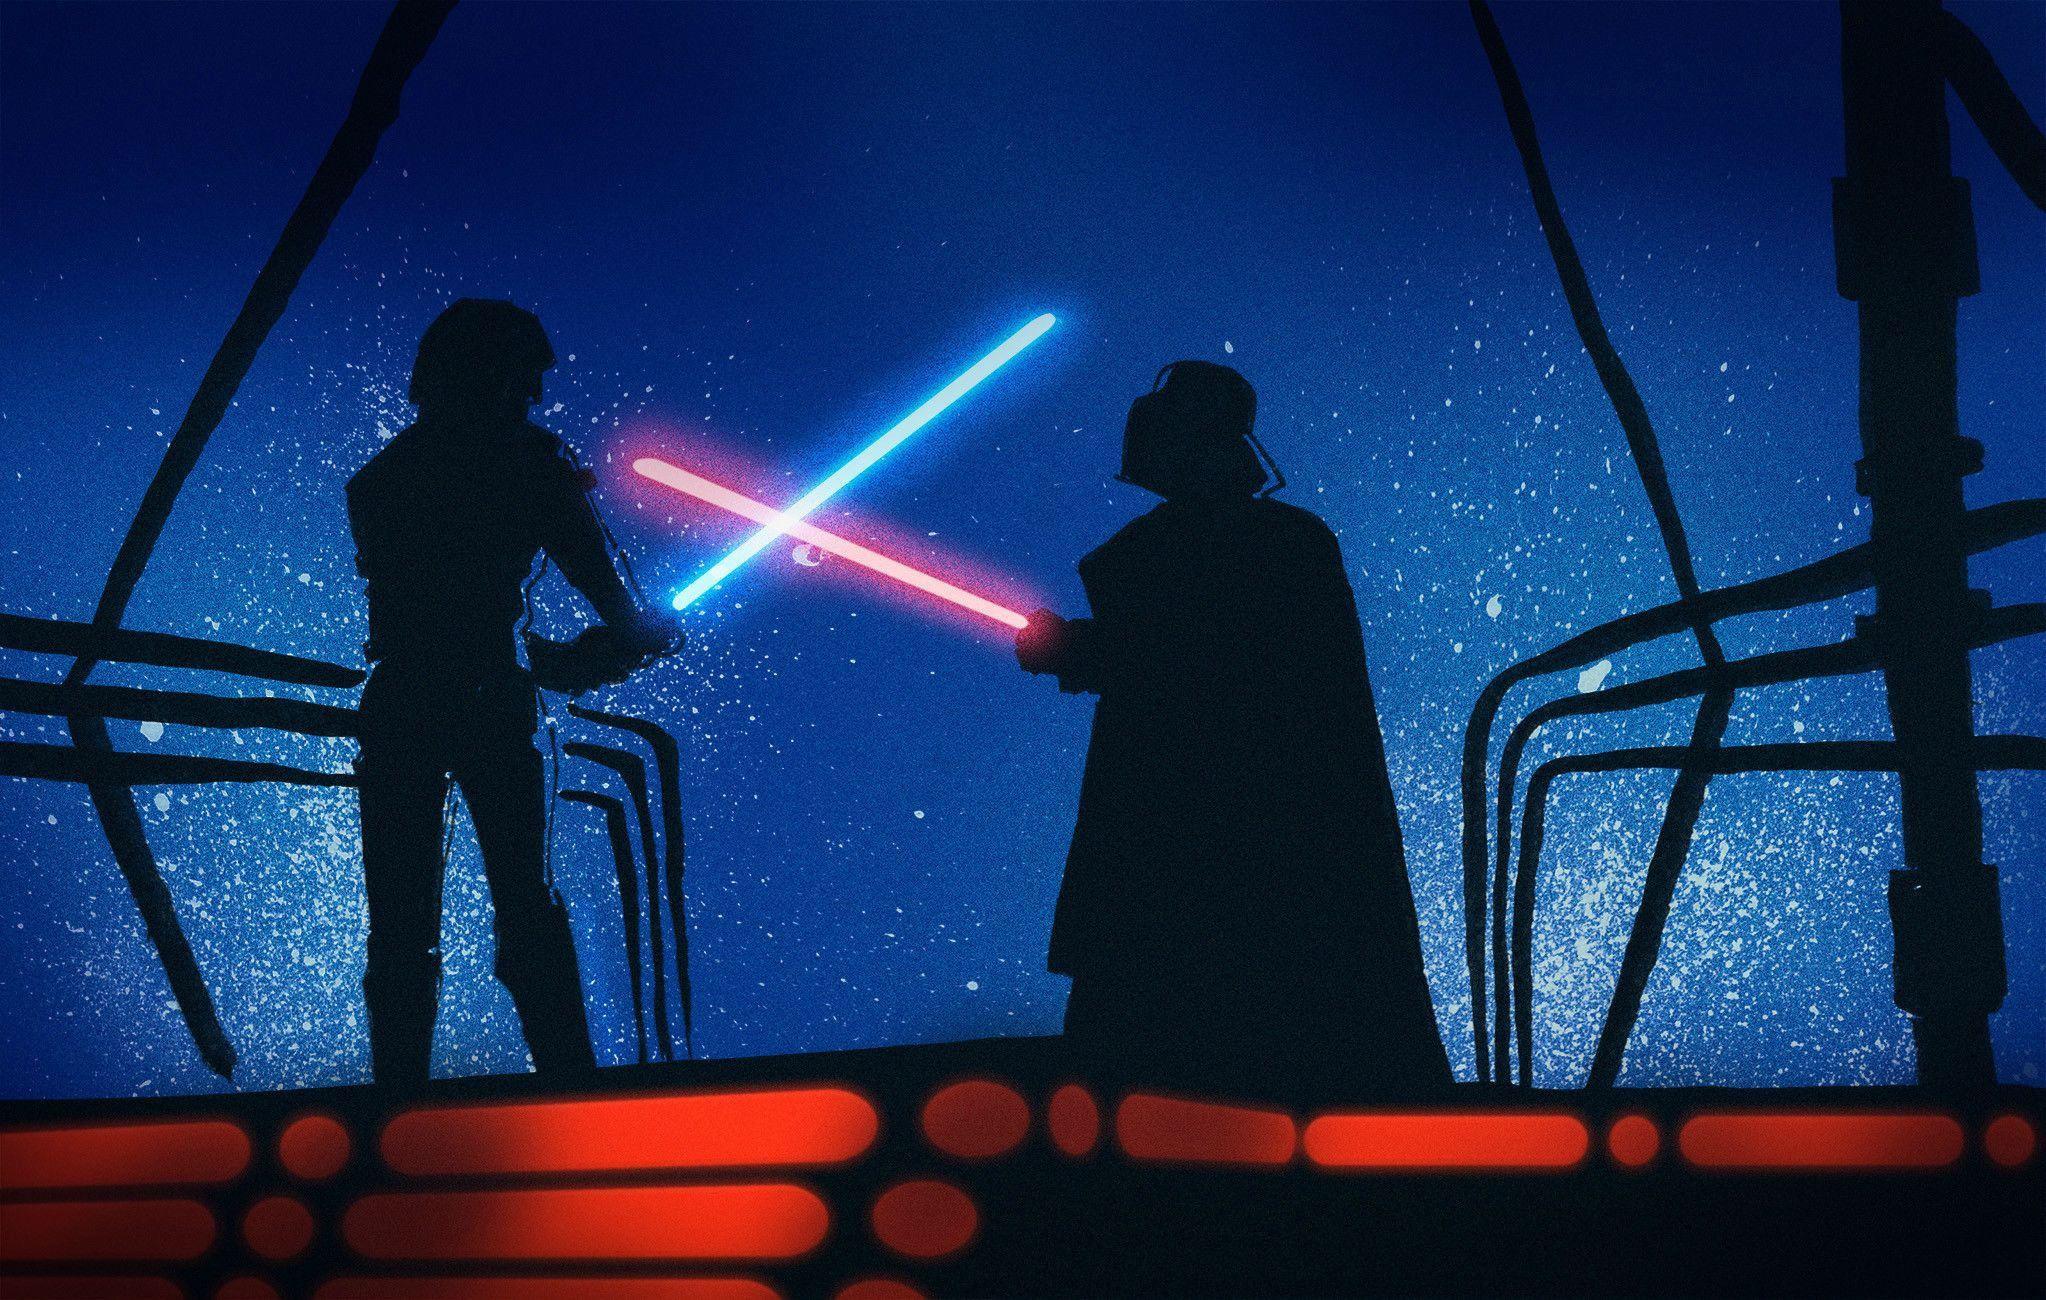 50 Beautiful Wallpapers For Sharing Luke Skywalker Darth Vader Darth Vader Wallpaper Star Wars Wallpaper